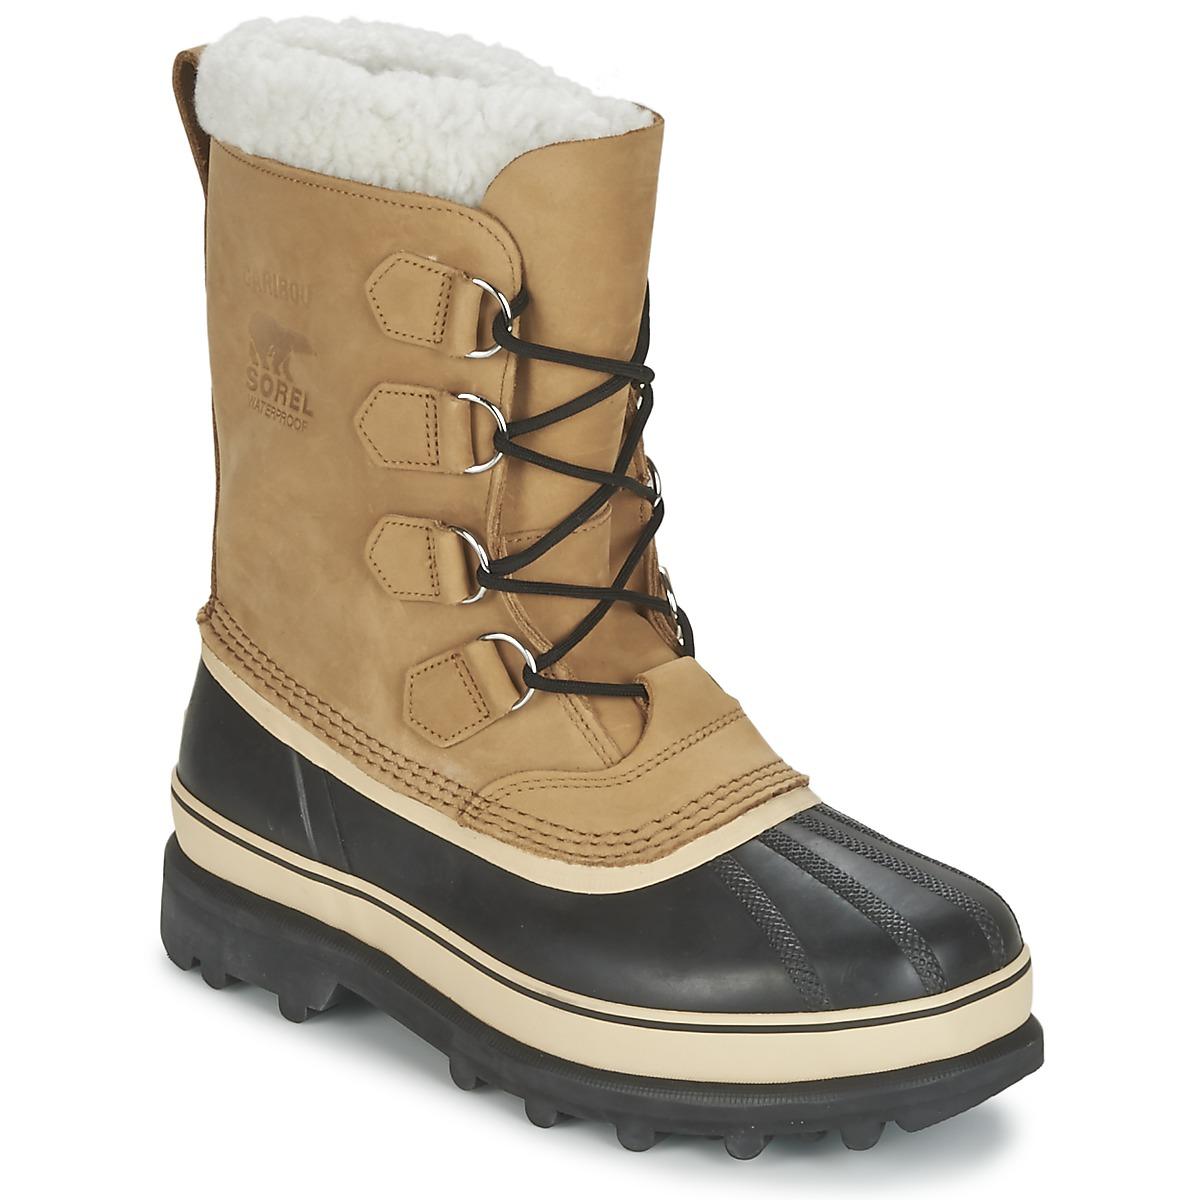 Stivale Da Neve Uomo Grande Scelta Di Stivali Consegna Bettina Sandal Beige Scarpe Sorel Caribou